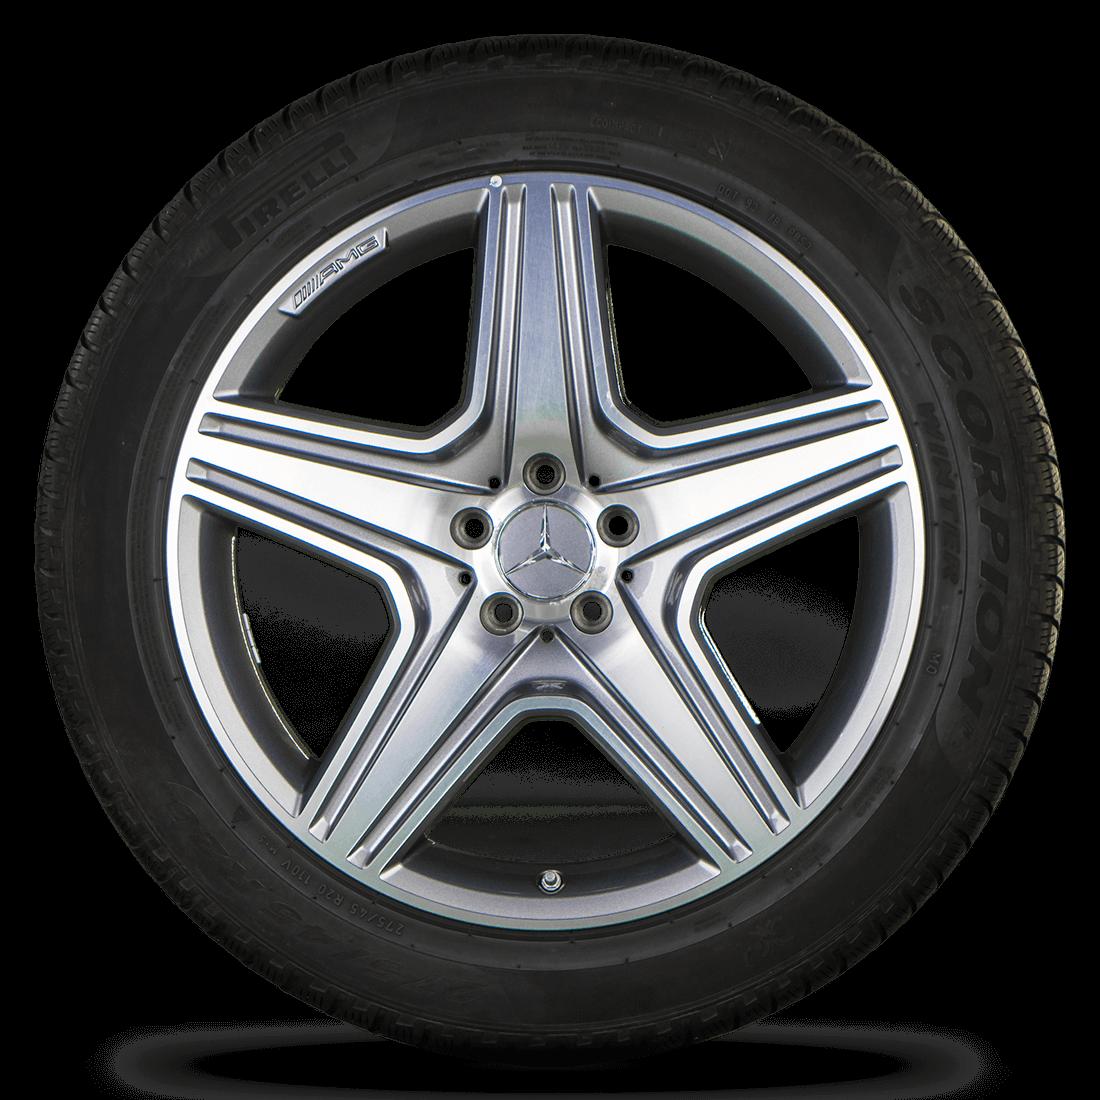 AMG Mercedes Benz GL GL63 X166 SUV 20 Zoll Felgen Alufelgen Winterreifen